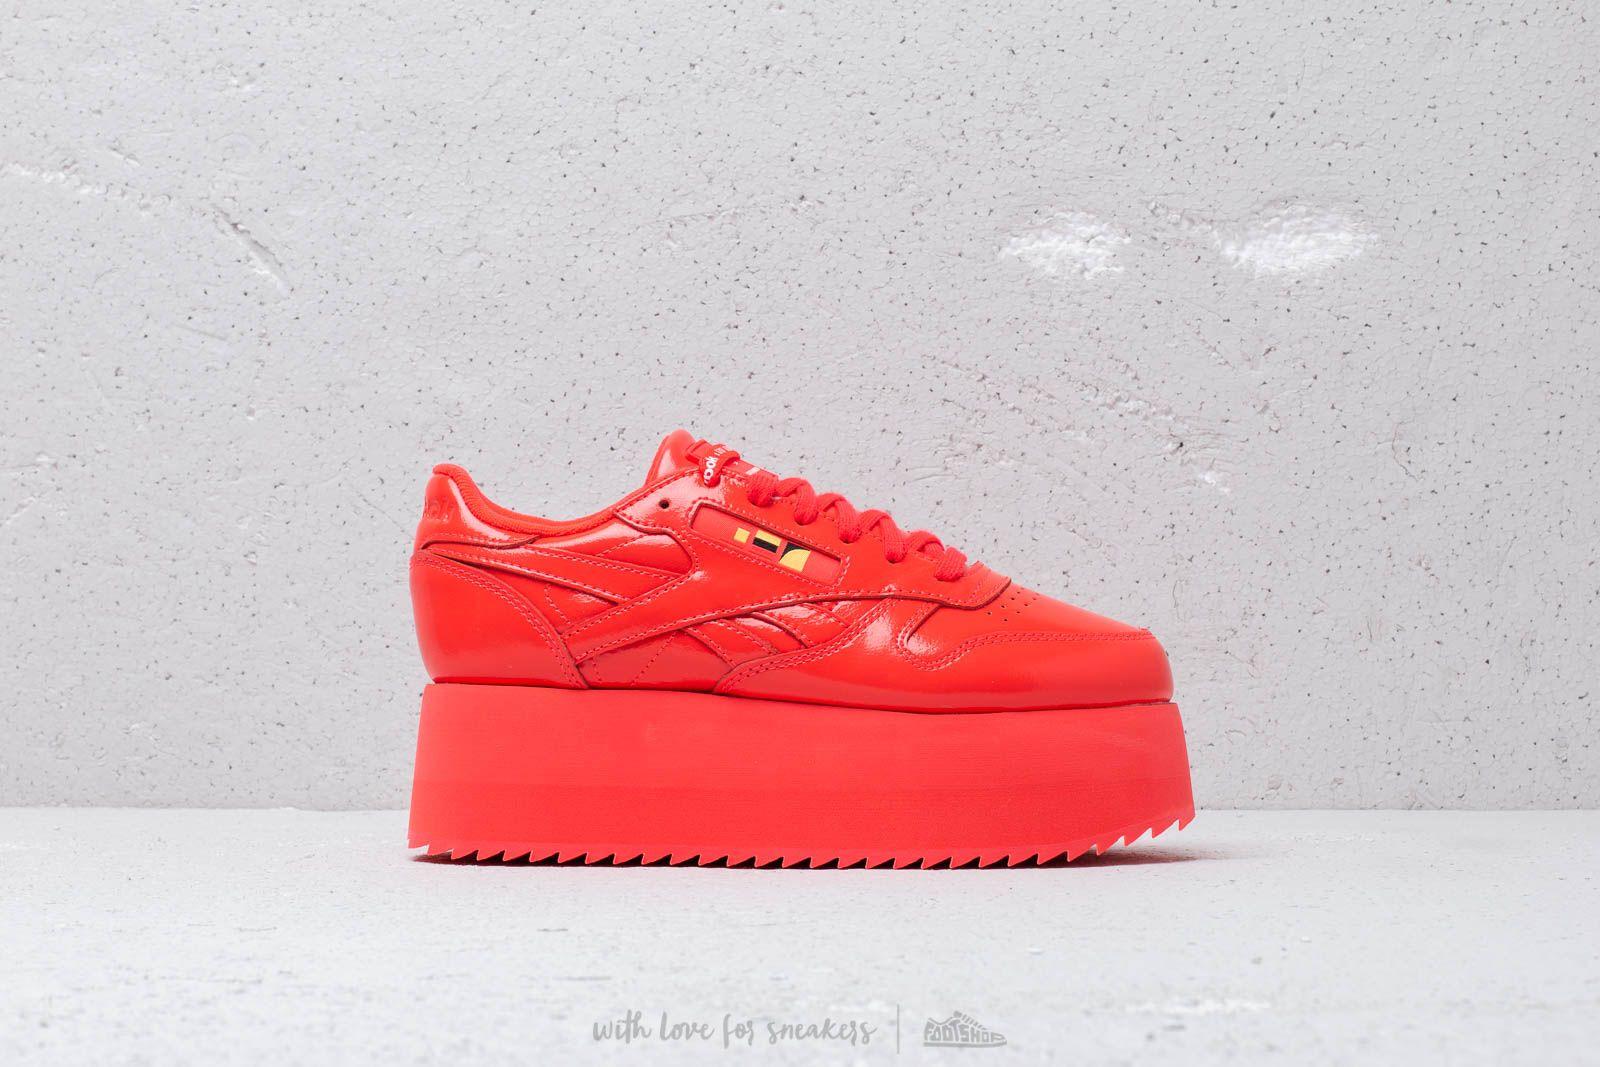 e5569f99b18cd Reebok x Gigi Hadid Classic Leather Triple Platform Neon Red  White at a  great price